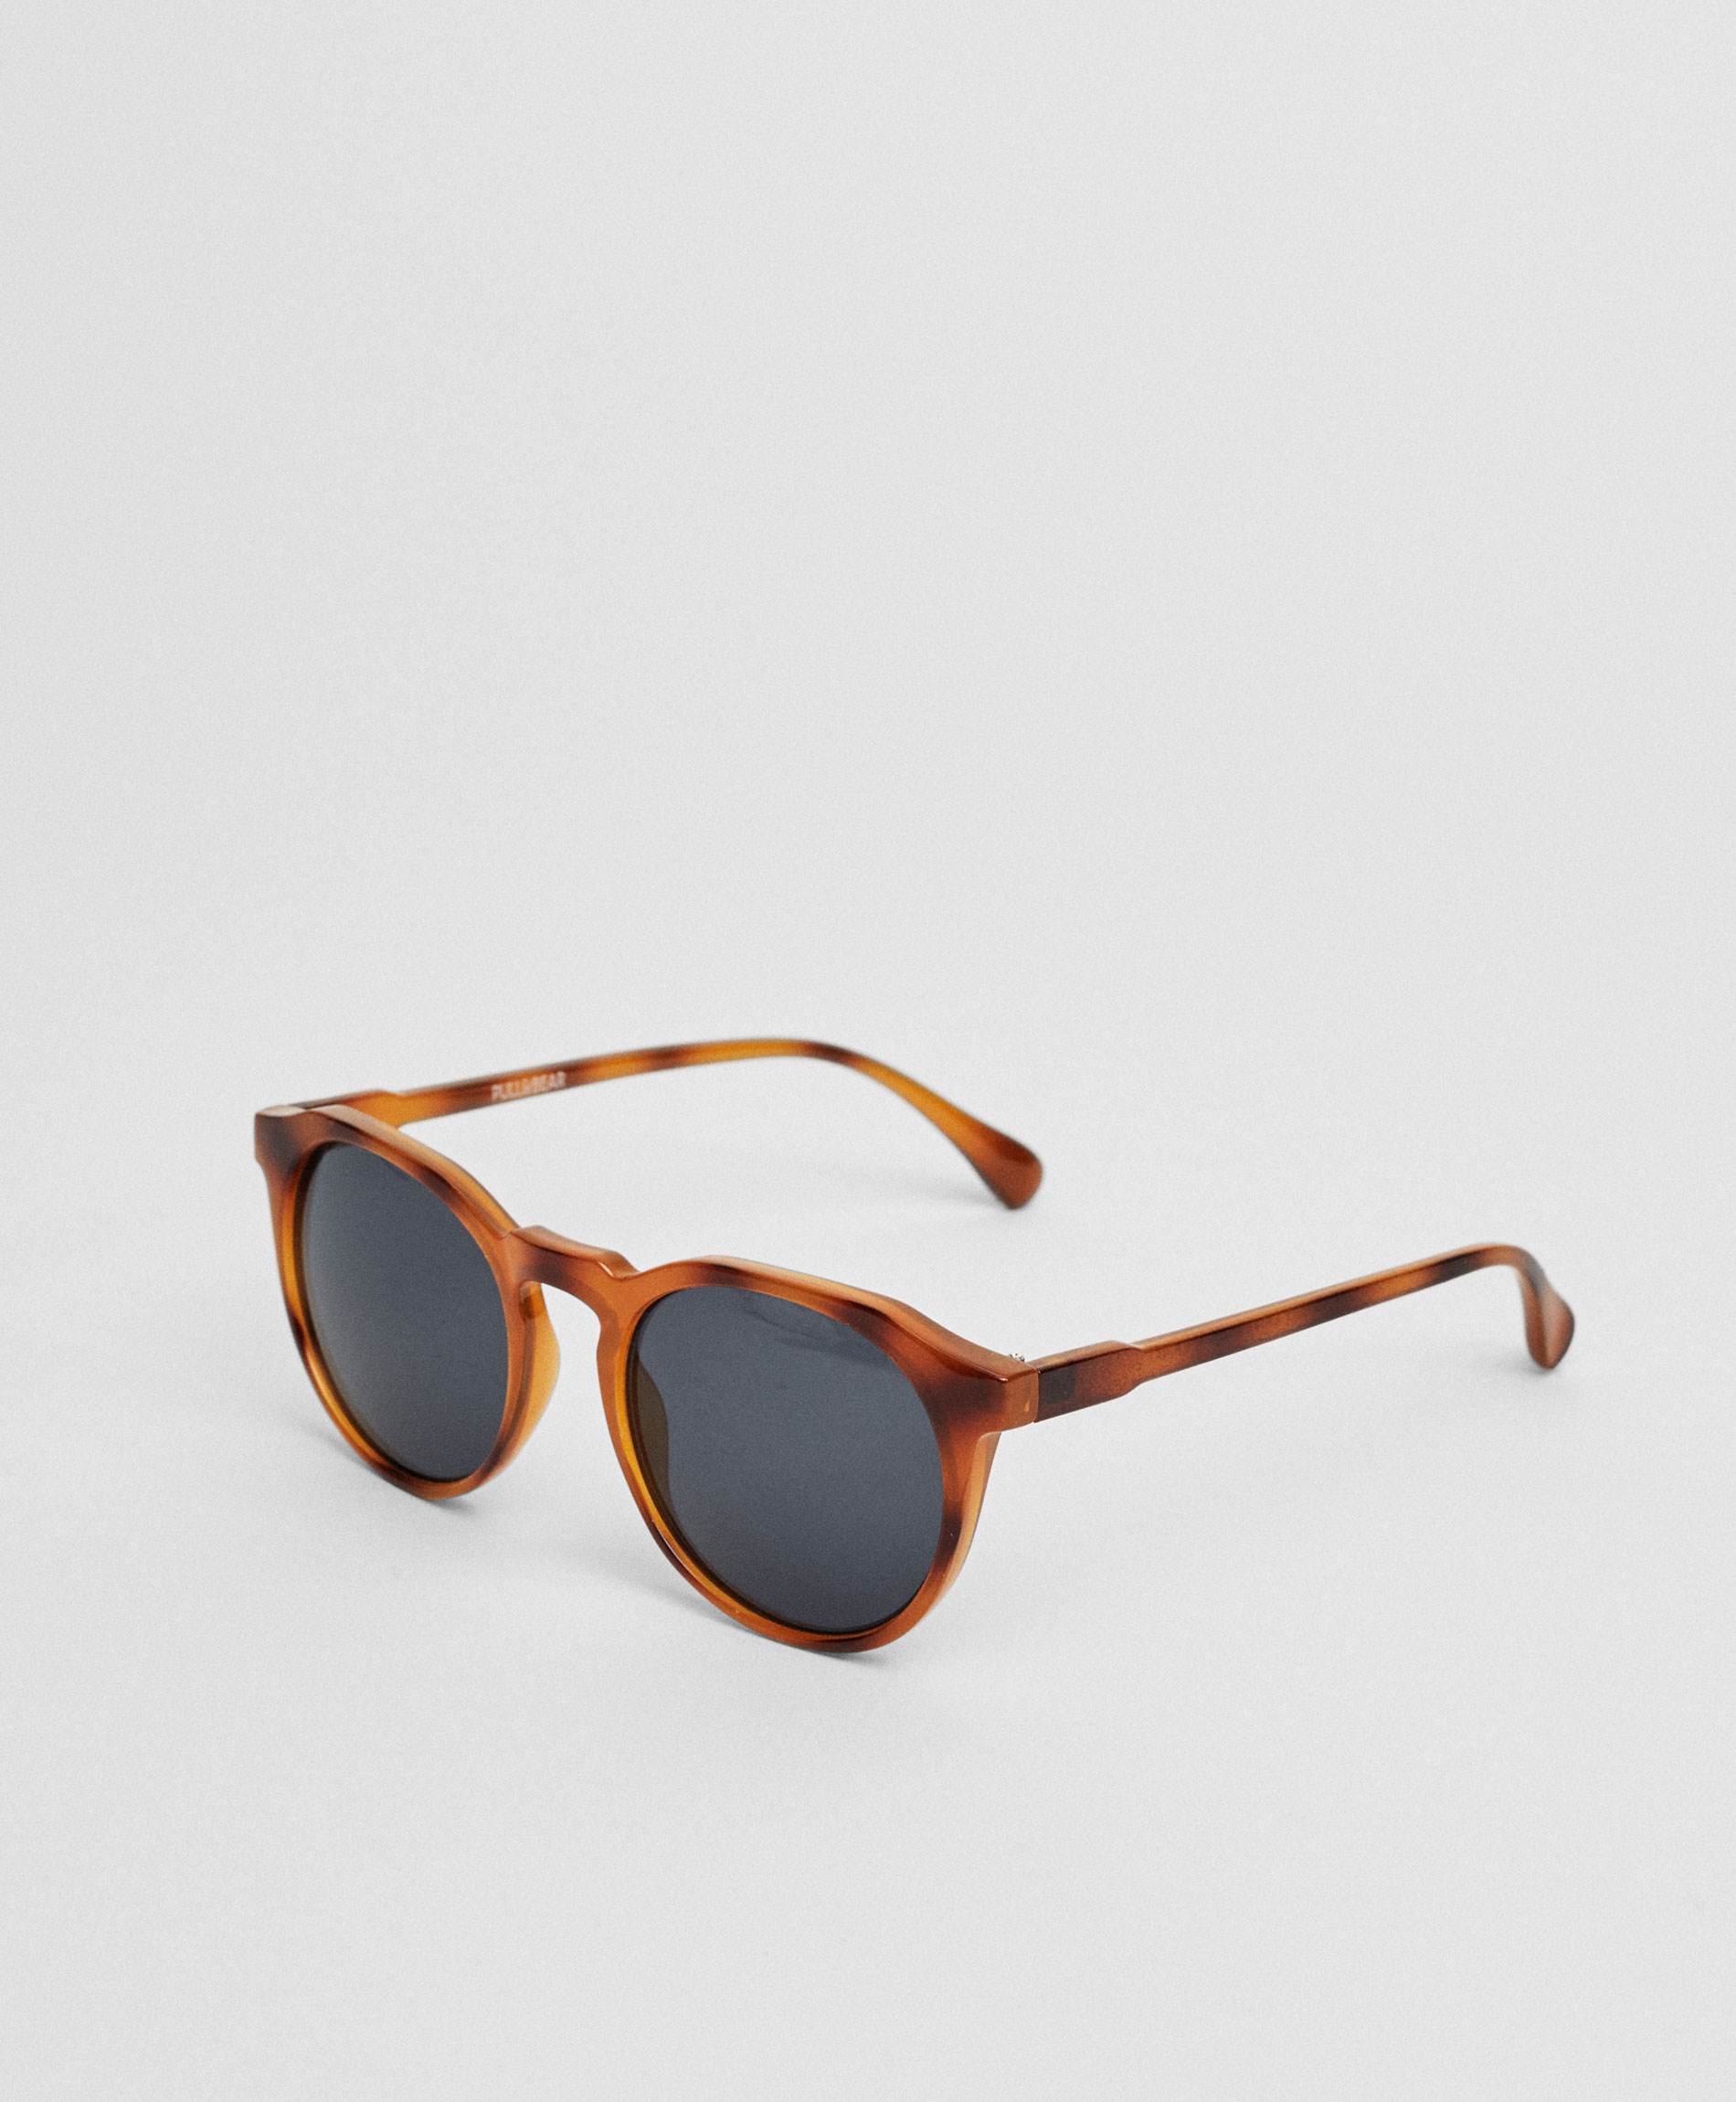 tortoise shell sunglasses yf02  Round resin tortoiseshell sunglasses